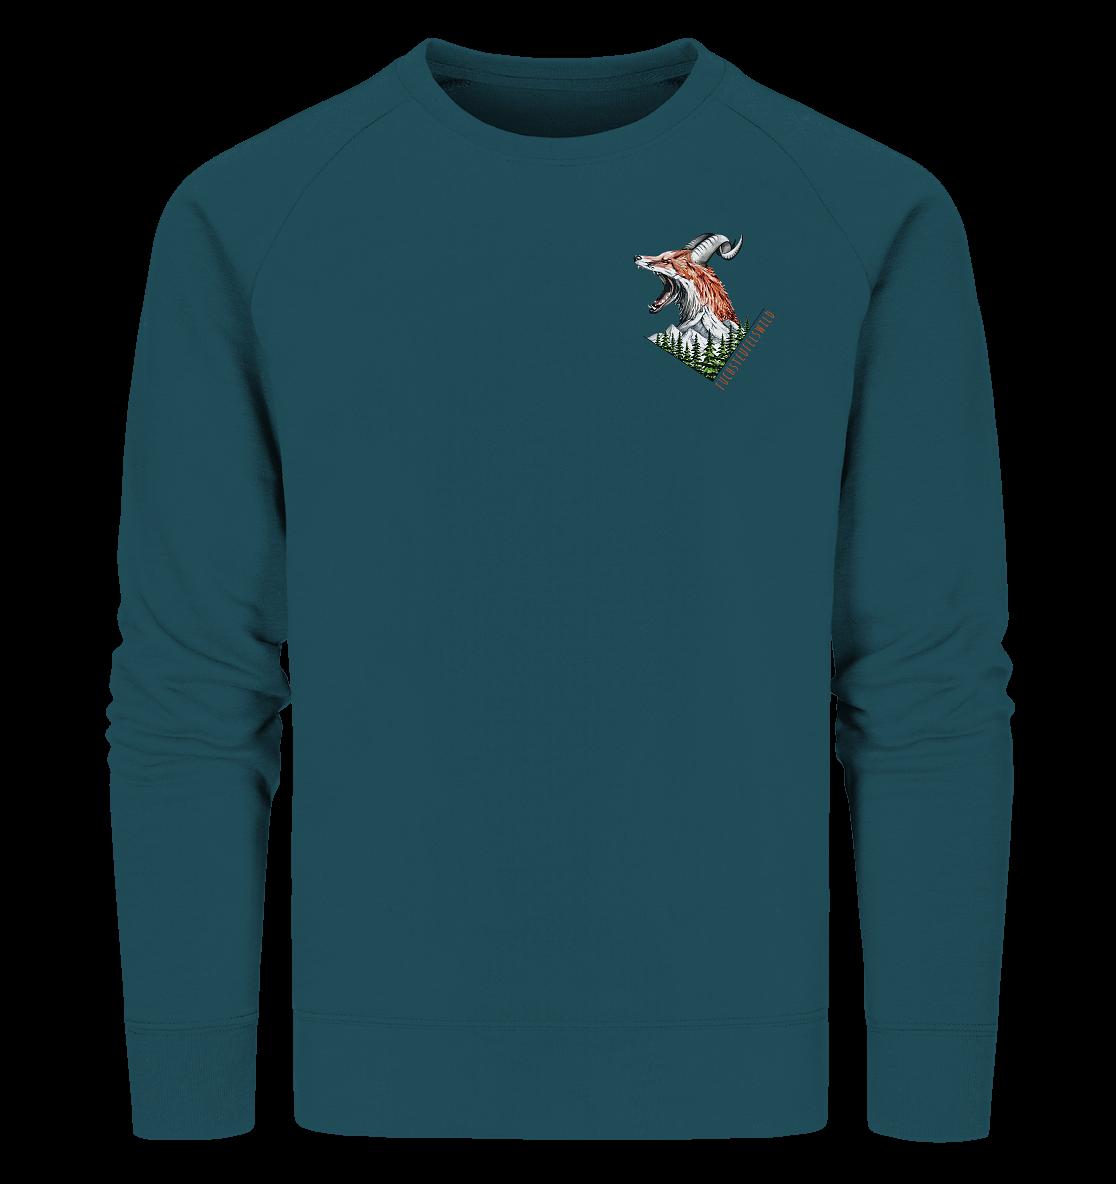 front-organic-sweatshirt-204d59-1116x-2.png